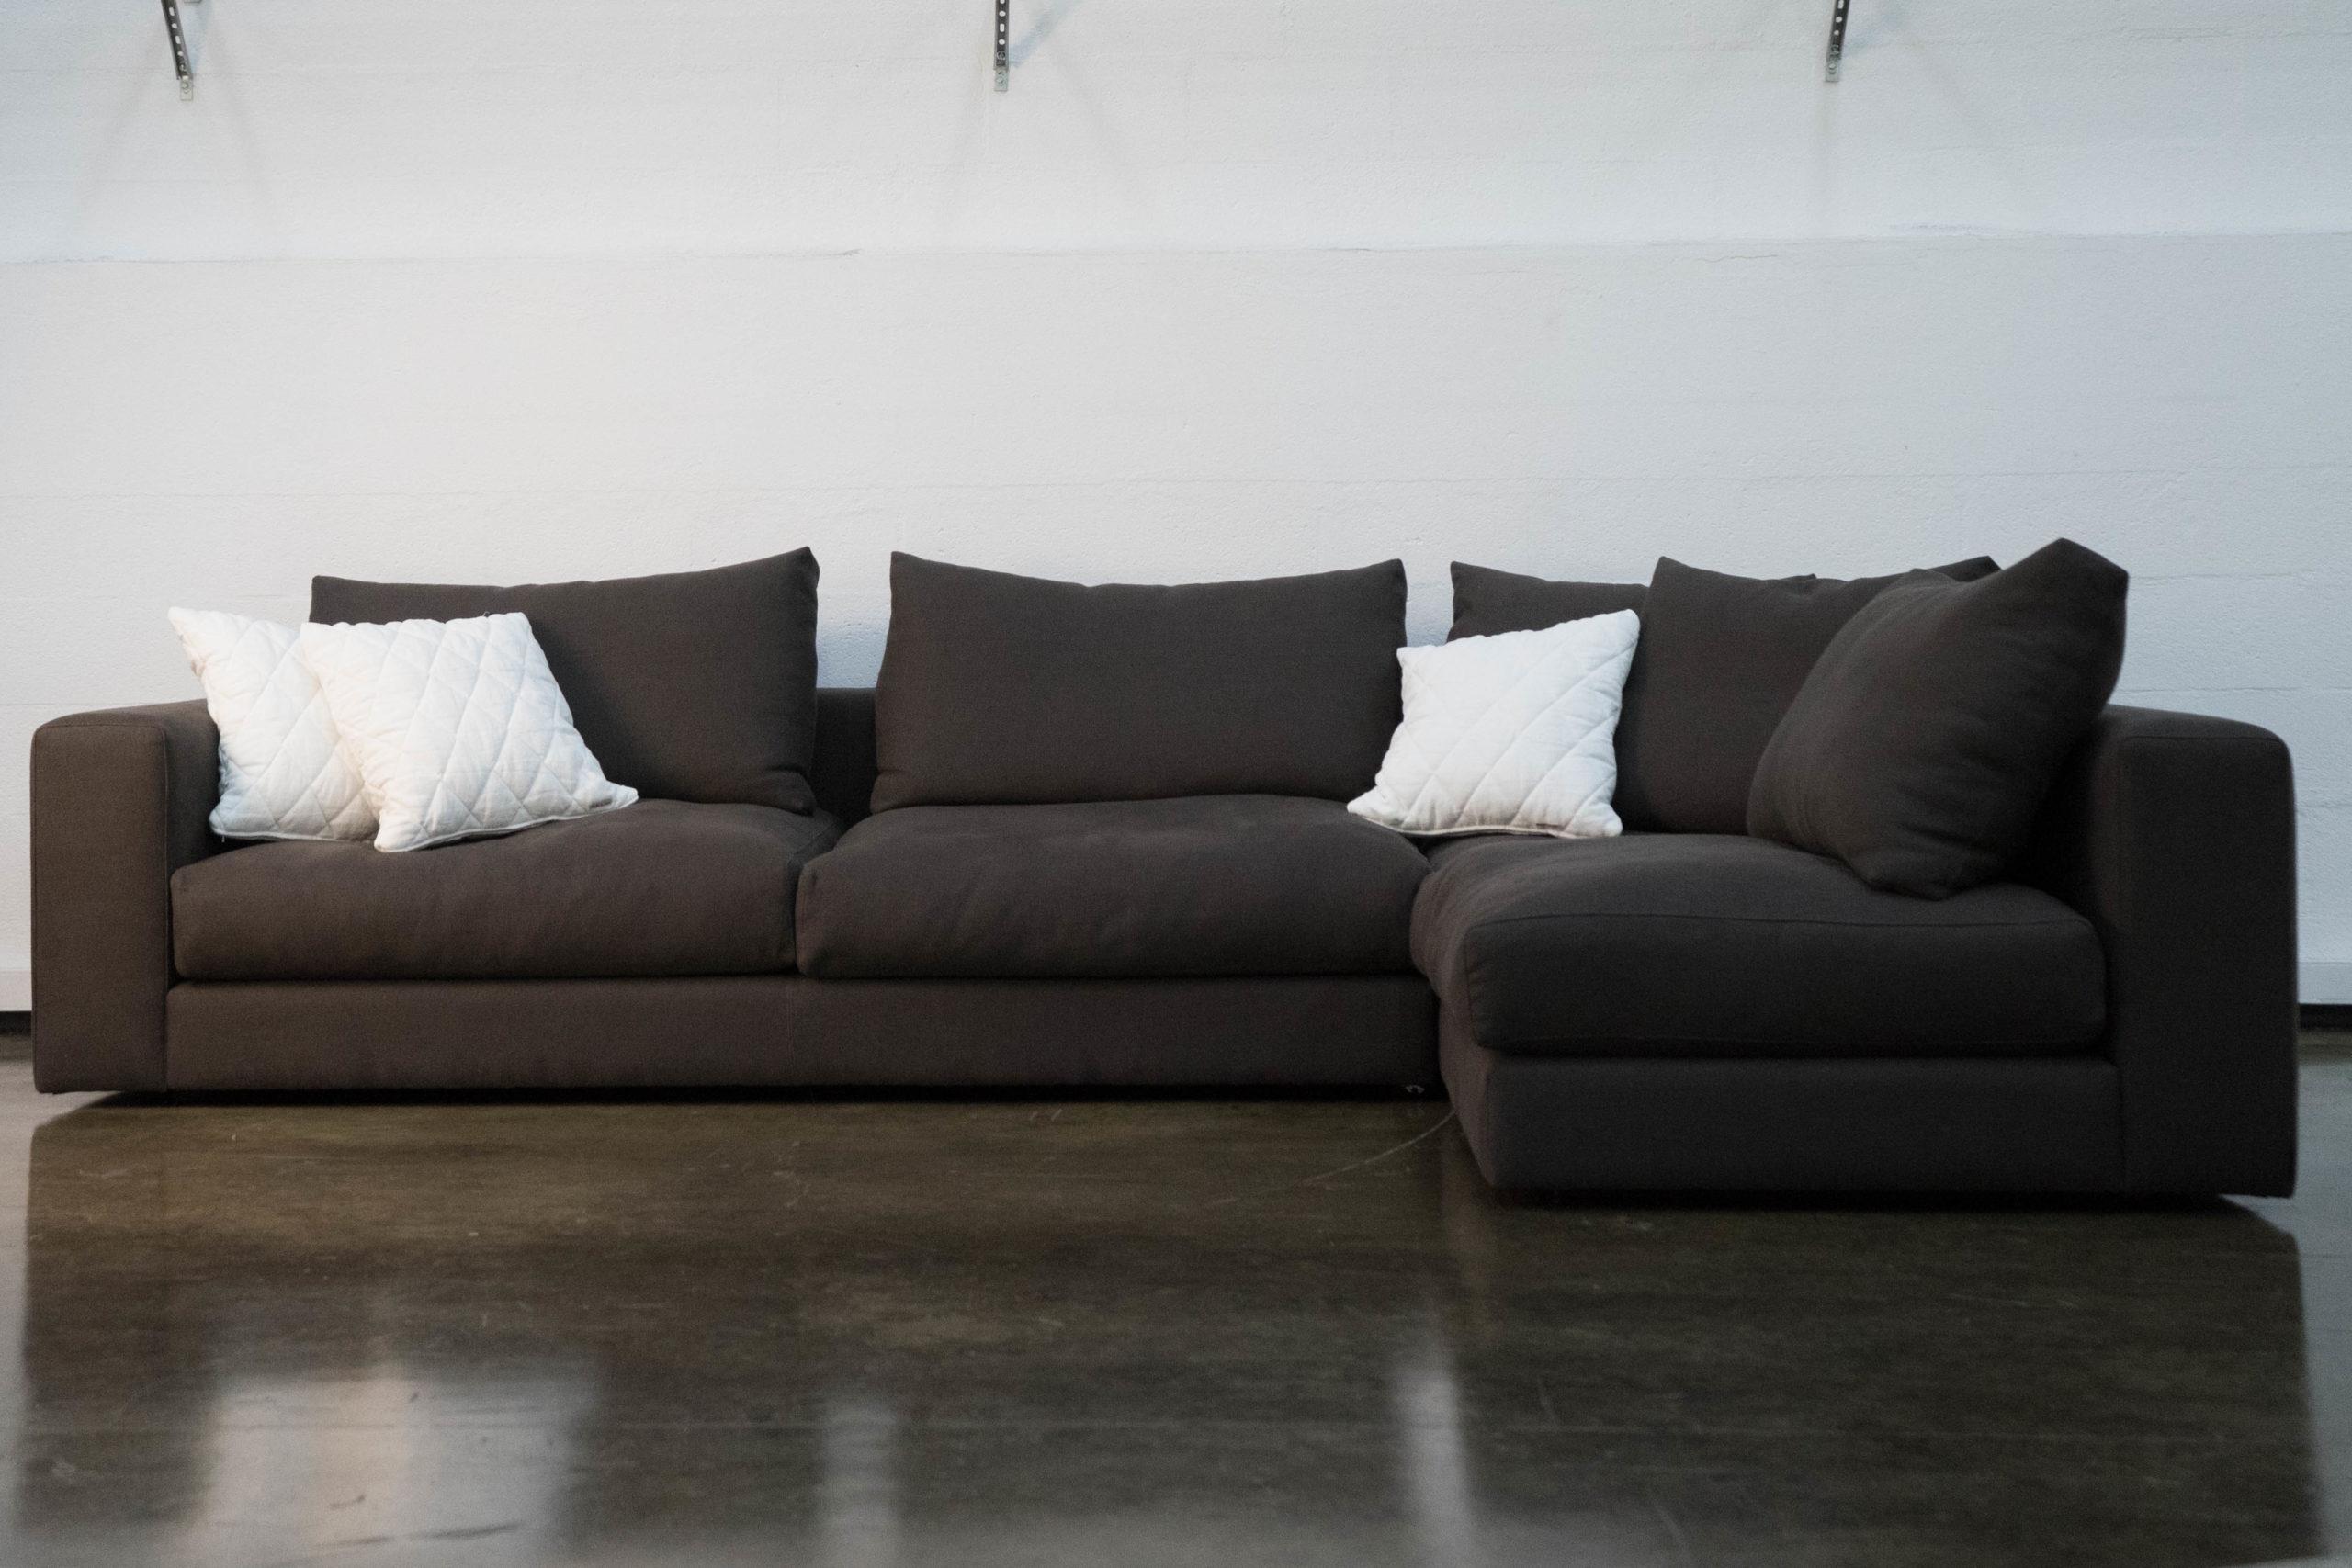 sofa a medida a mano calidad marron hecho a mano